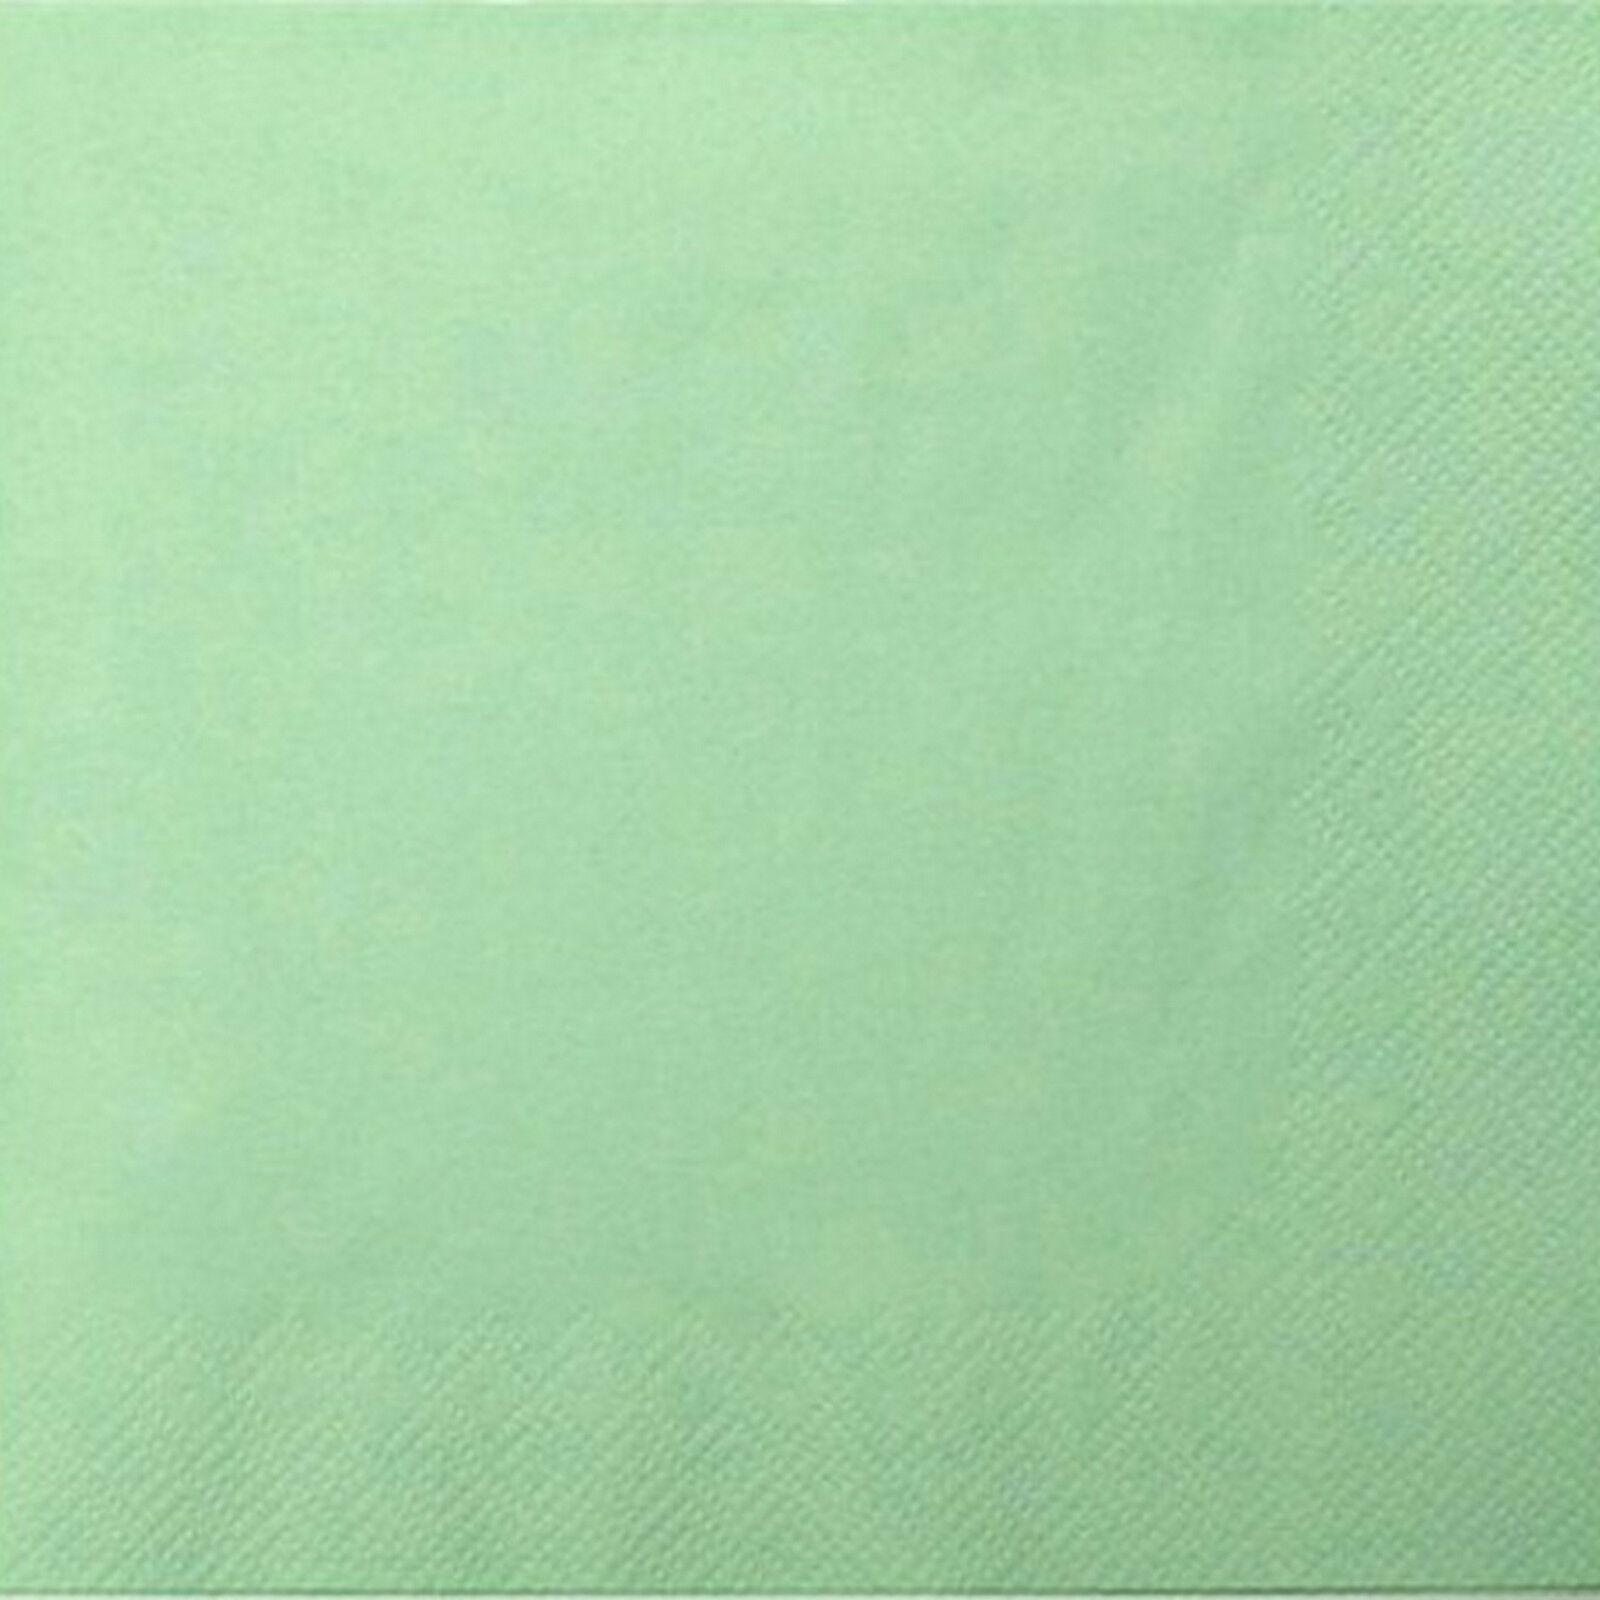 200 - 1.000 Stück Servietten 3-lagig 33x33 cm  Papierservietten Tissue-Qualität - Lindgrün (Pistachio), 200 Stück